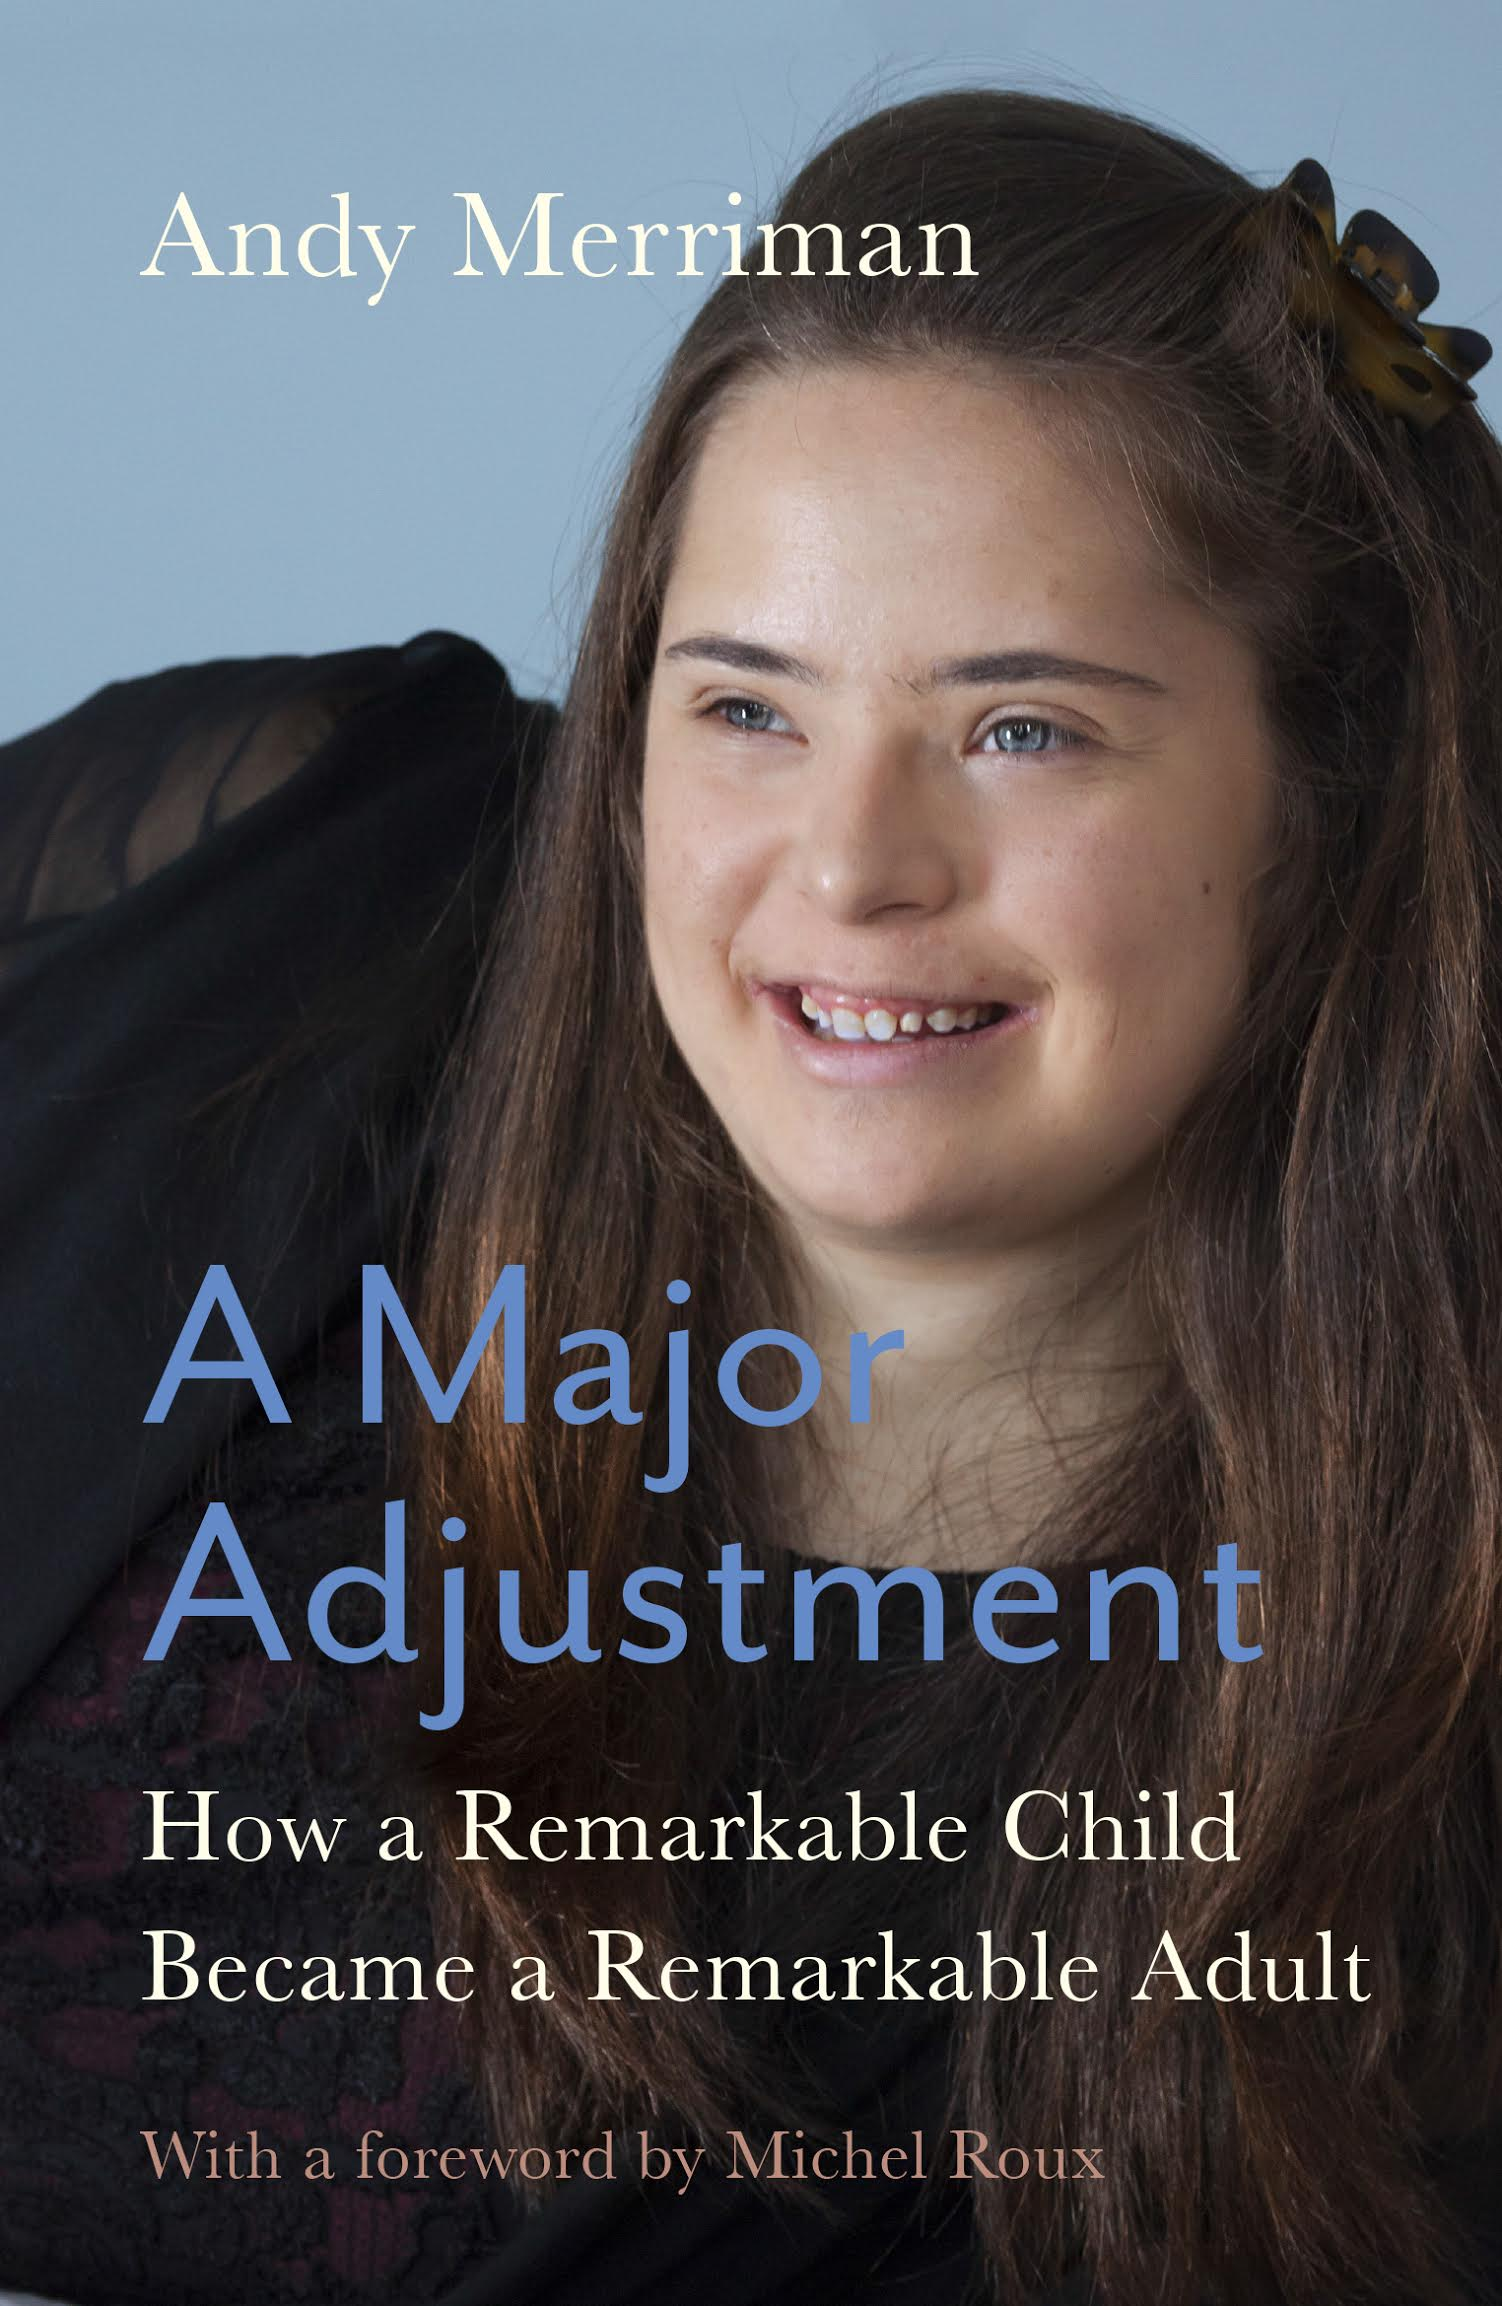 A Major Adjustment cover.jpg